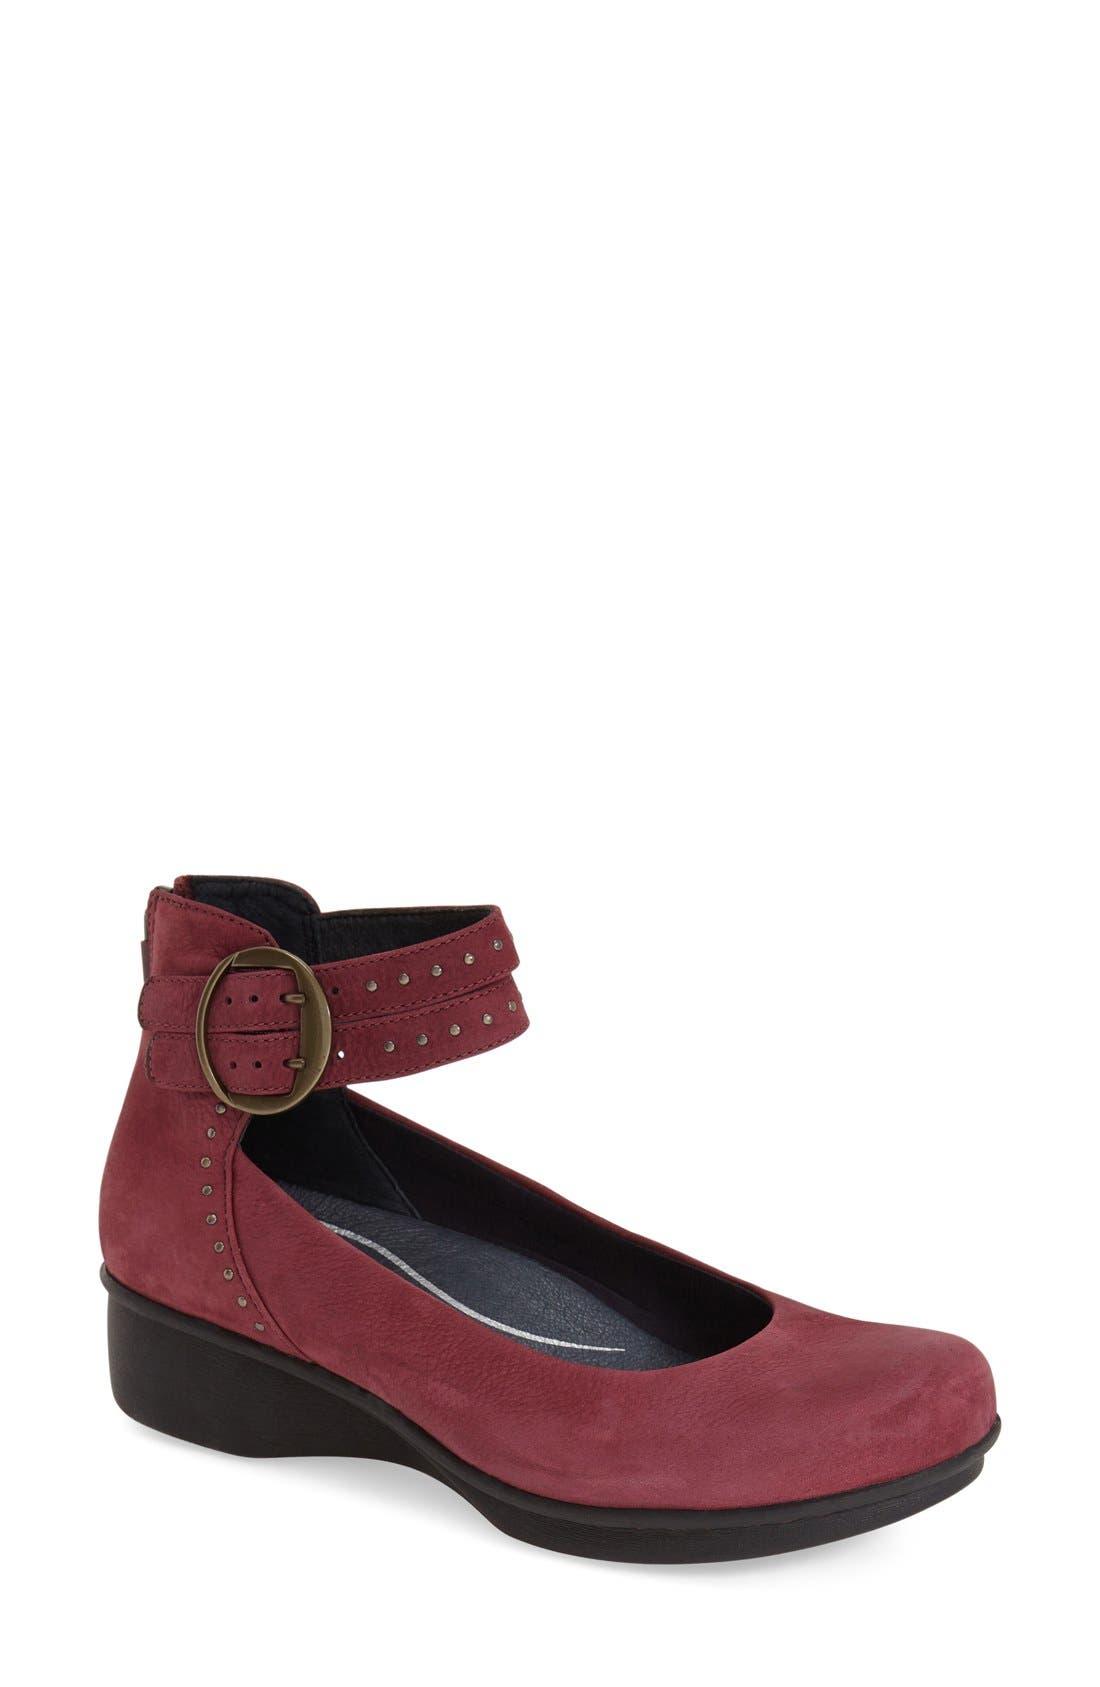 Main Image - Dansko 'Lois' Ankle Strap Wedge ...